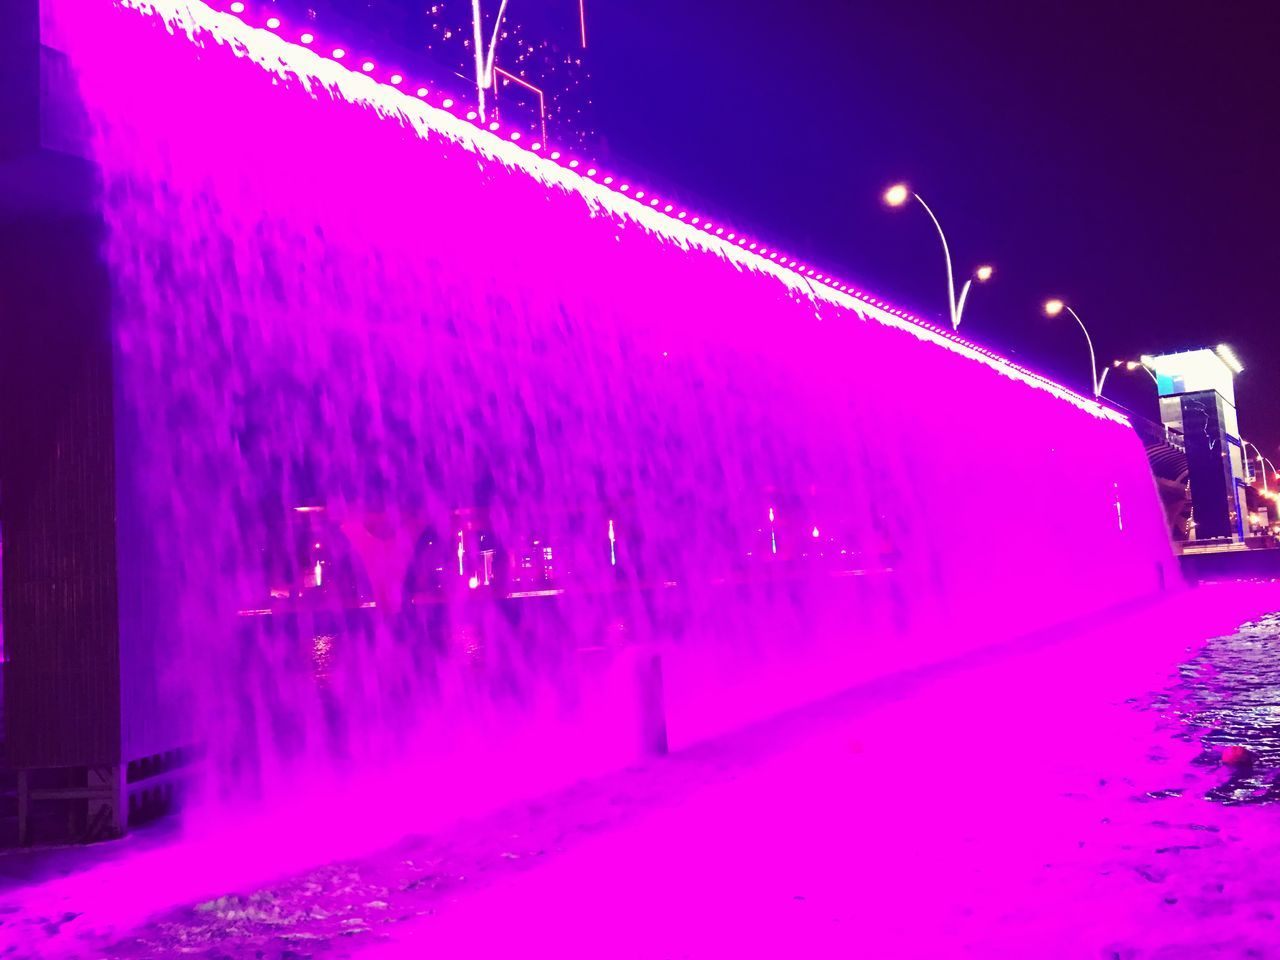 illuminated, night, cold temperature, winter, snow, lighting equipment, outdoors, real people, street light, neon, architecture, nature, sky